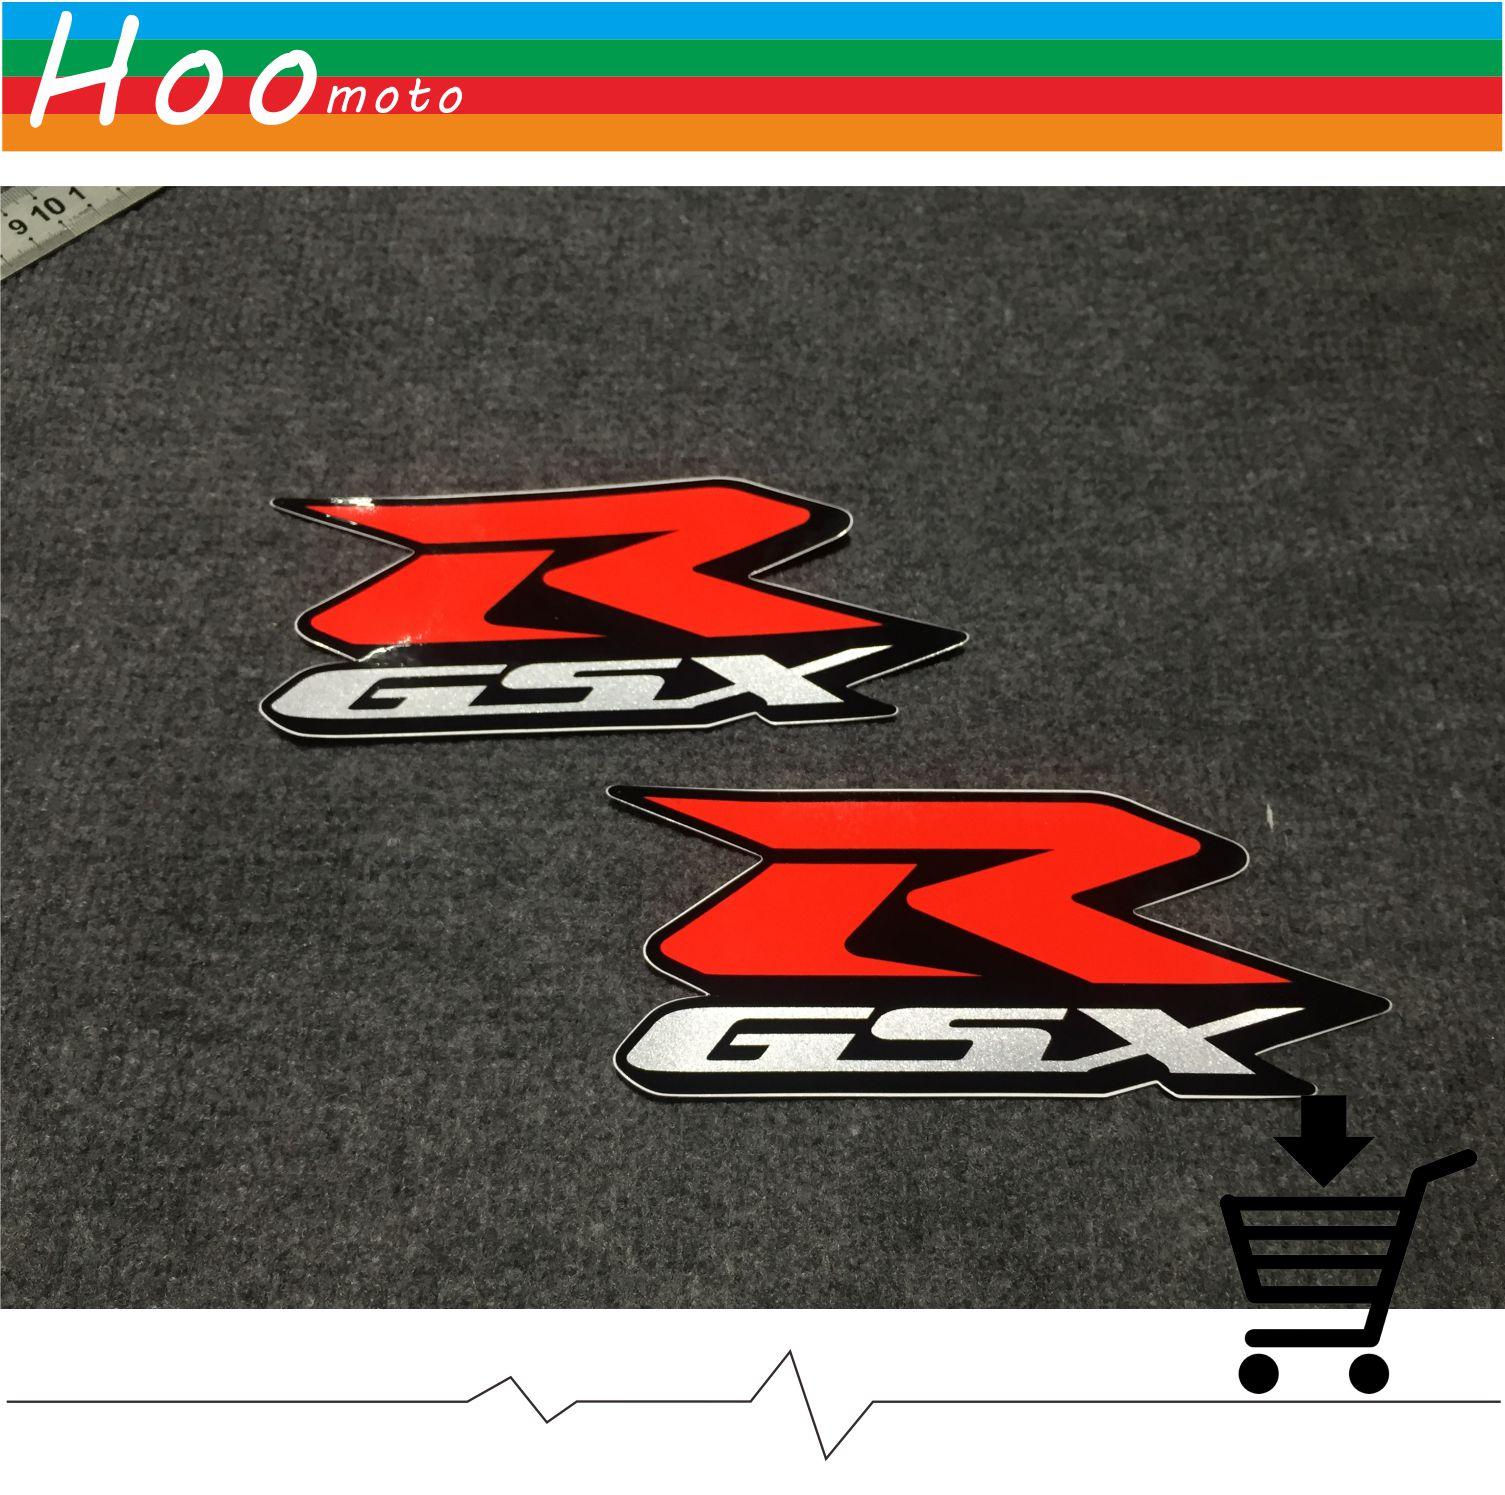 17.5*7.5cm GSXR GSX R Motorcycle Reflective Sticker and decals A pair  For SUZUKI GSXR 600 750 1000 K1 K2 K3 K4 K5 K6 K7 K8 H1 k r k naidu a v ramana and r veeraraghavaiah common vetch management in rice fallow blackgram